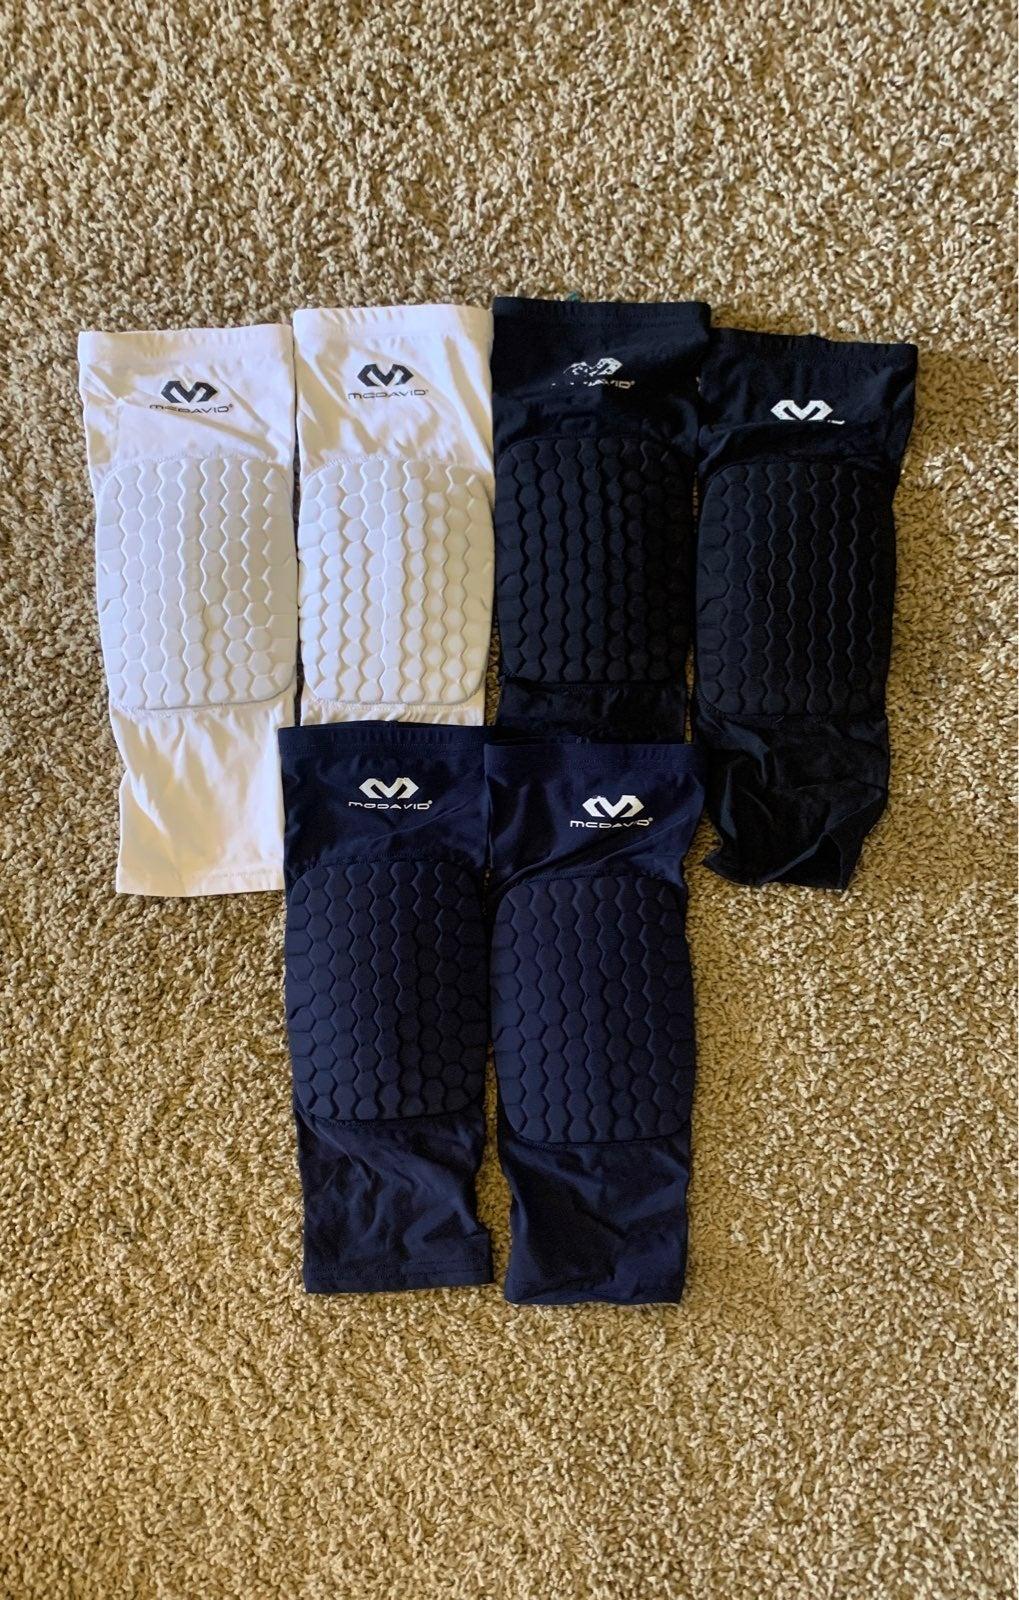 McDavid hex compression knee pads LG